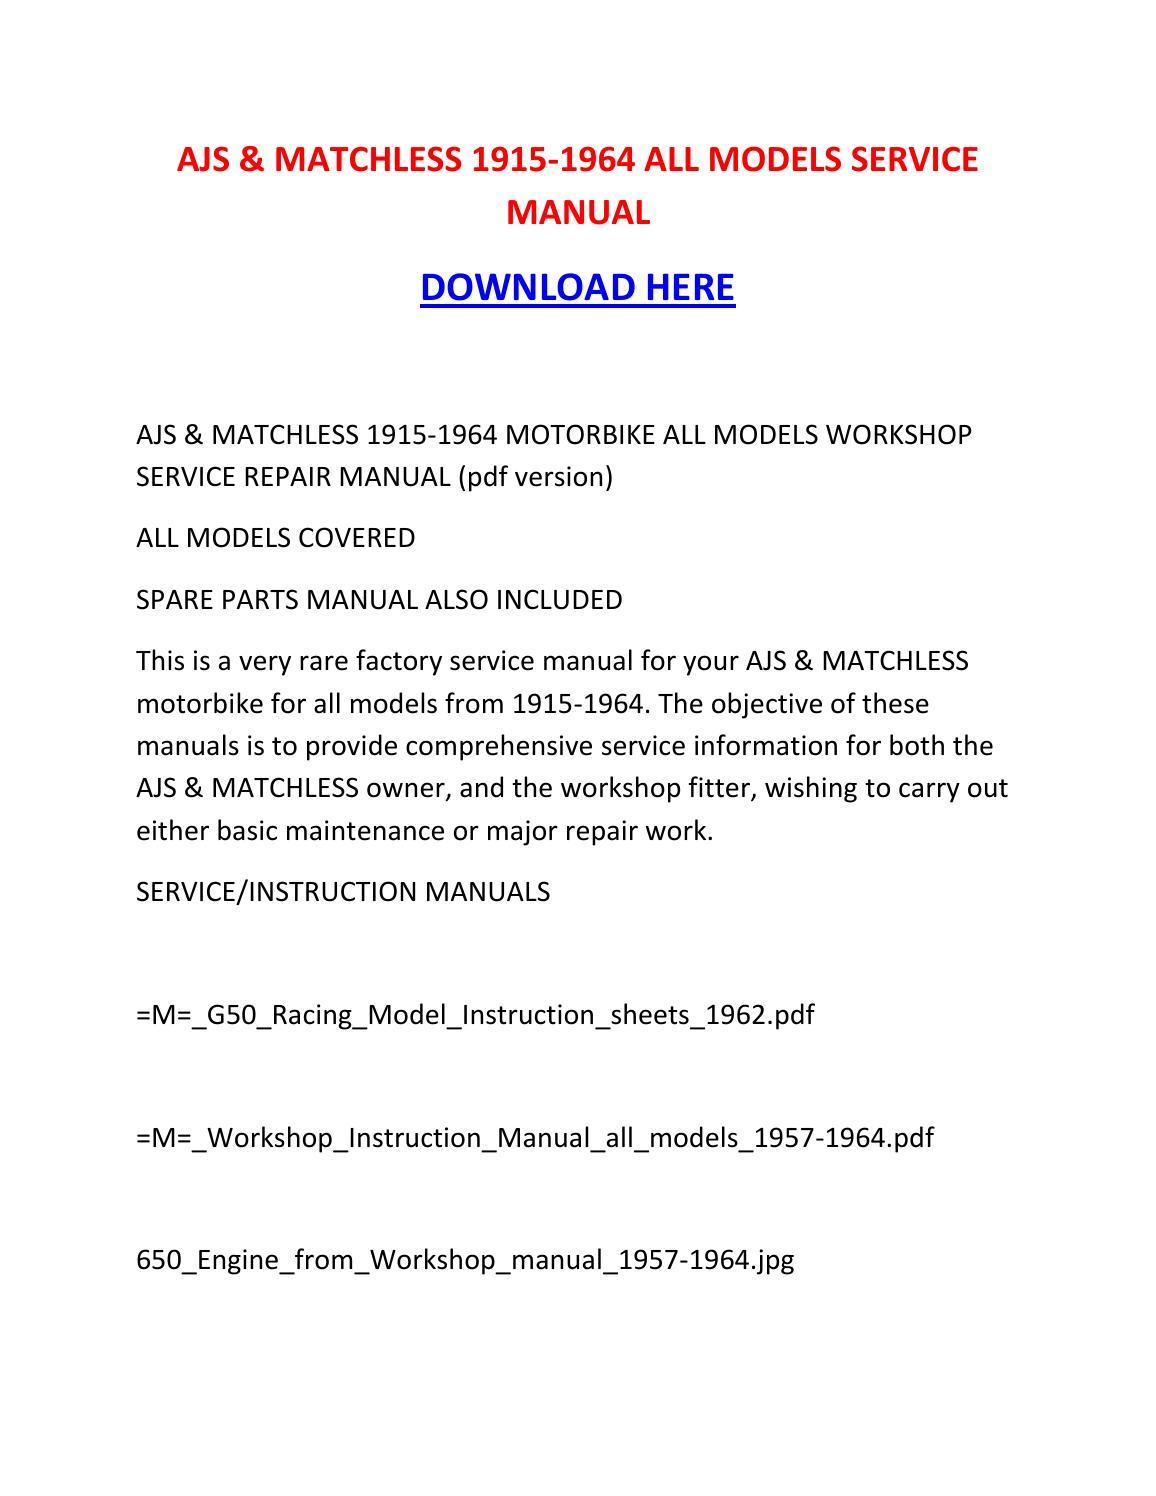 1964 fairlane workshop manual pdf